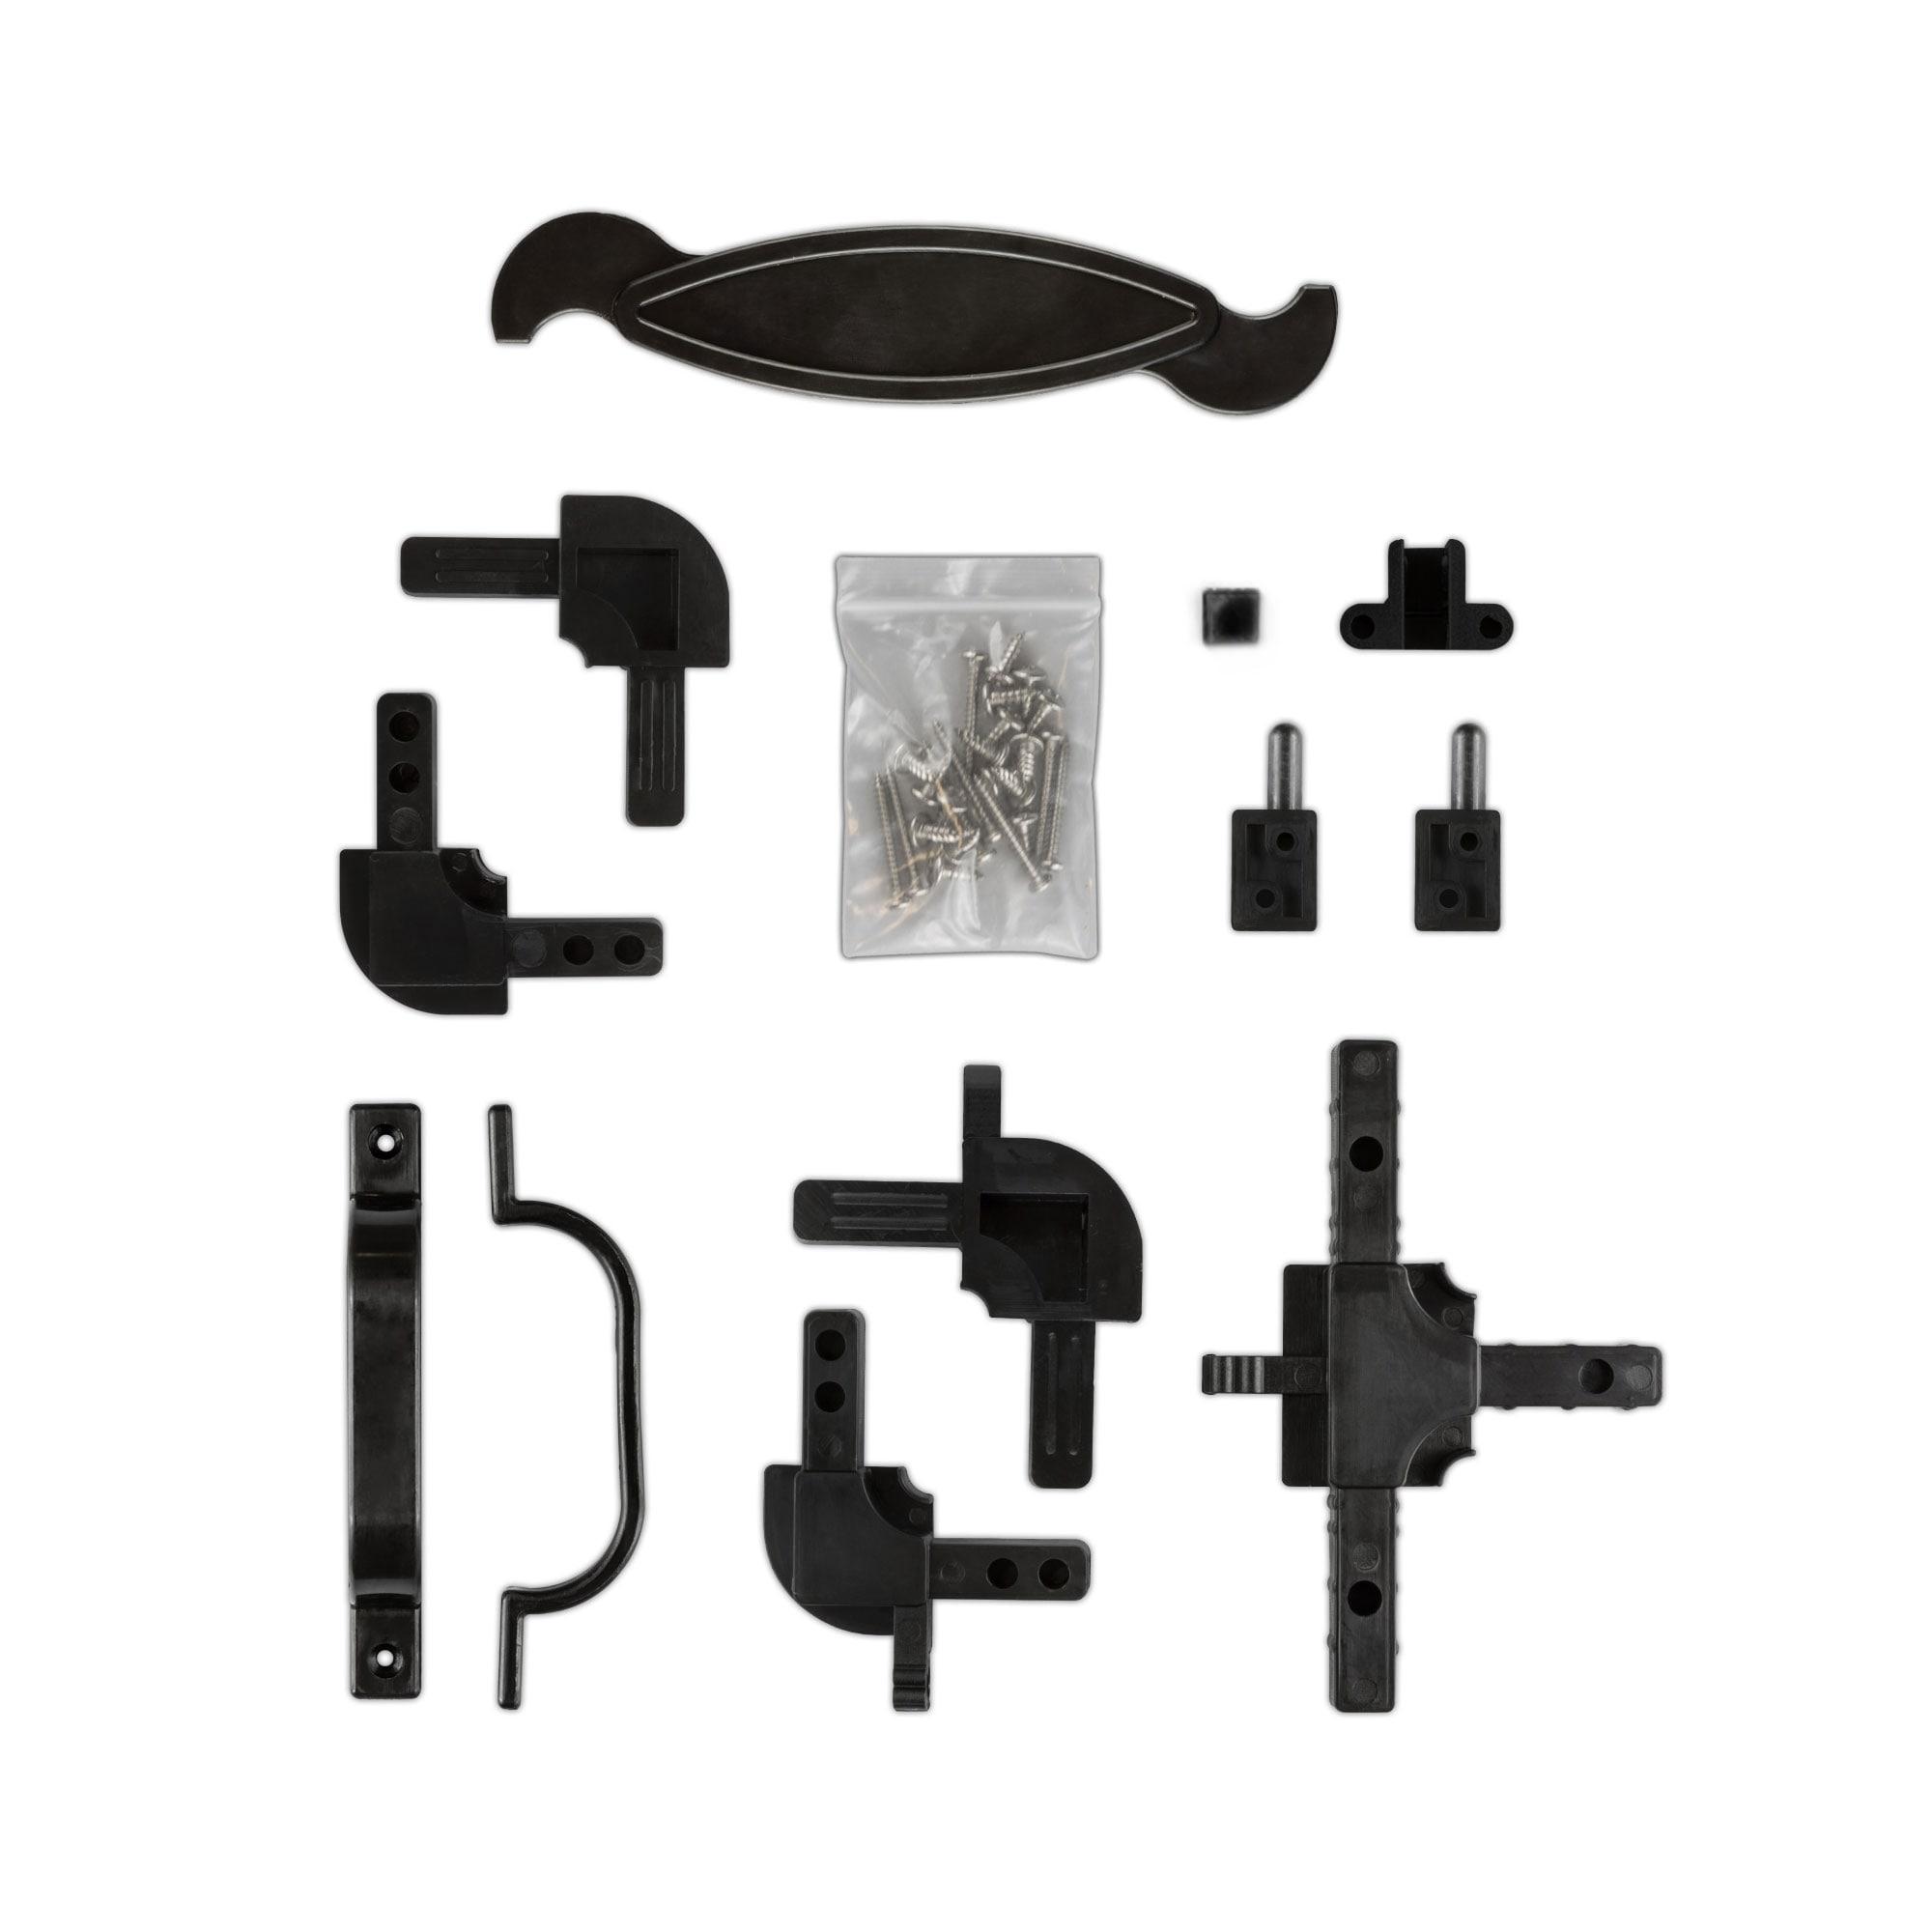 doppelrollo zubehr best motorl sae with doppelrollo. Black Bedroom Furniture Sets. Home Design Ideas